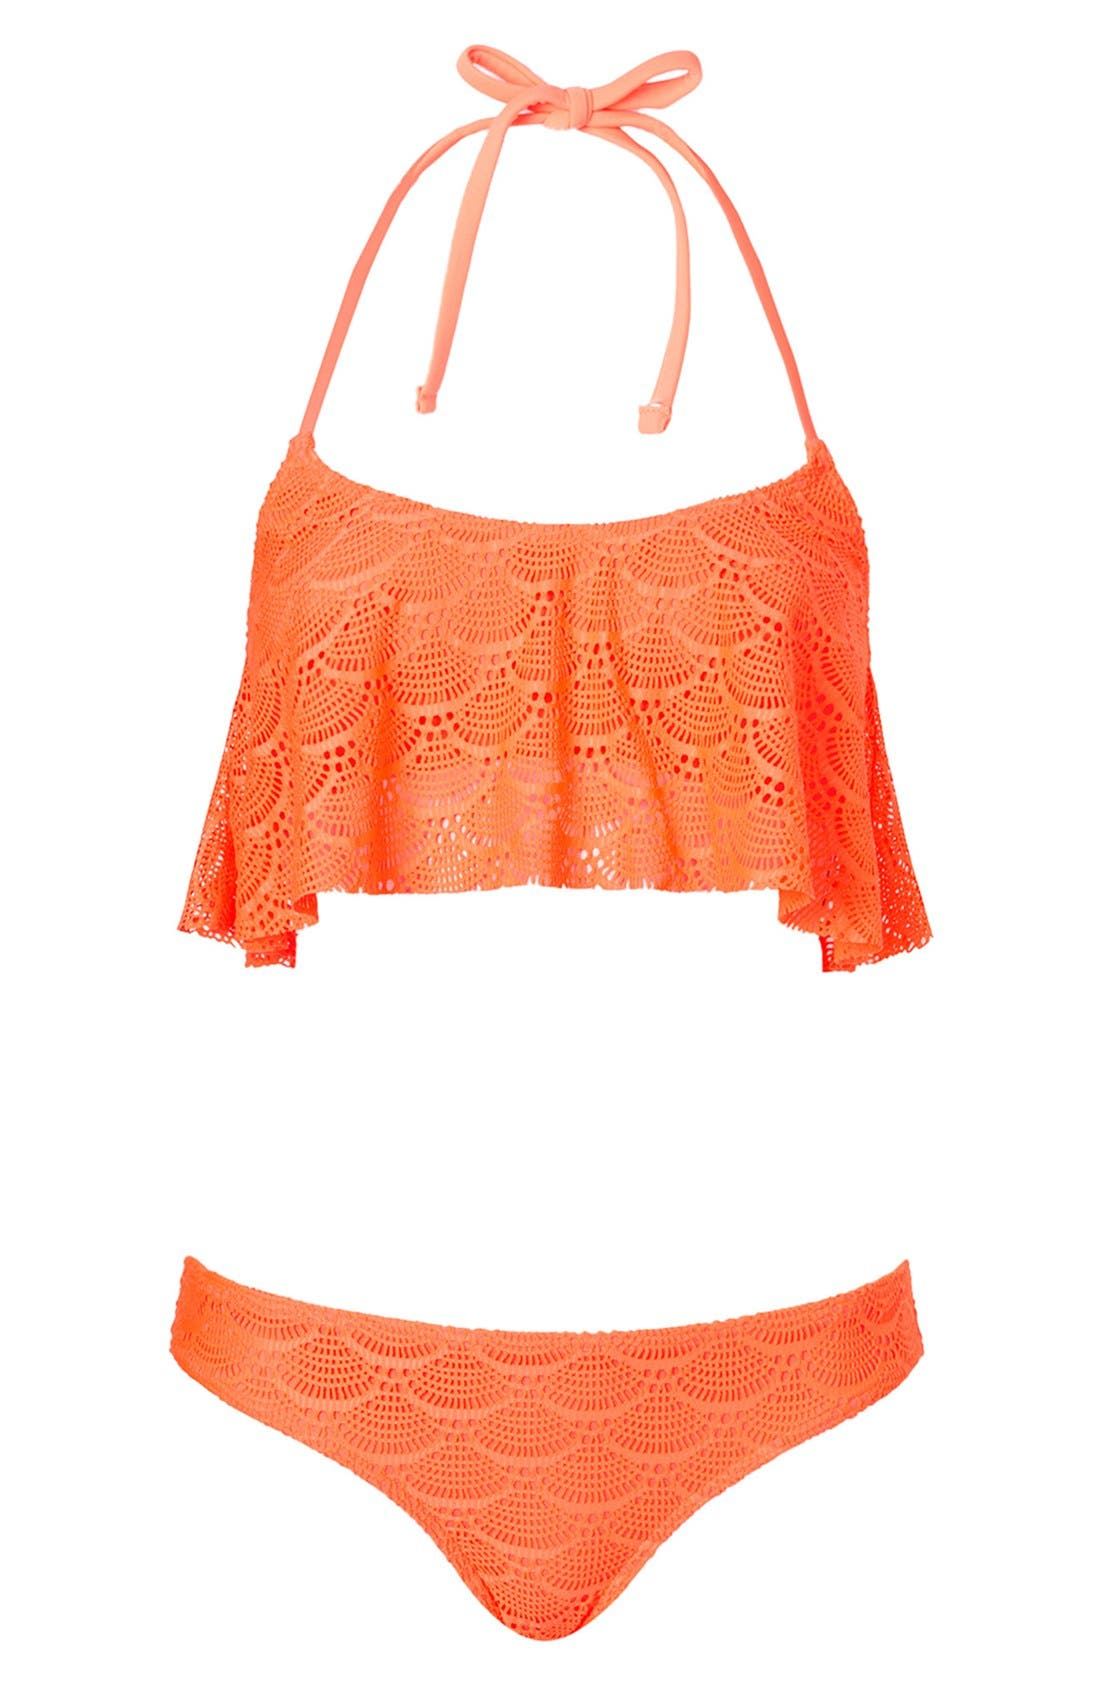 Main Image - Topshop Crochet Bikini Set